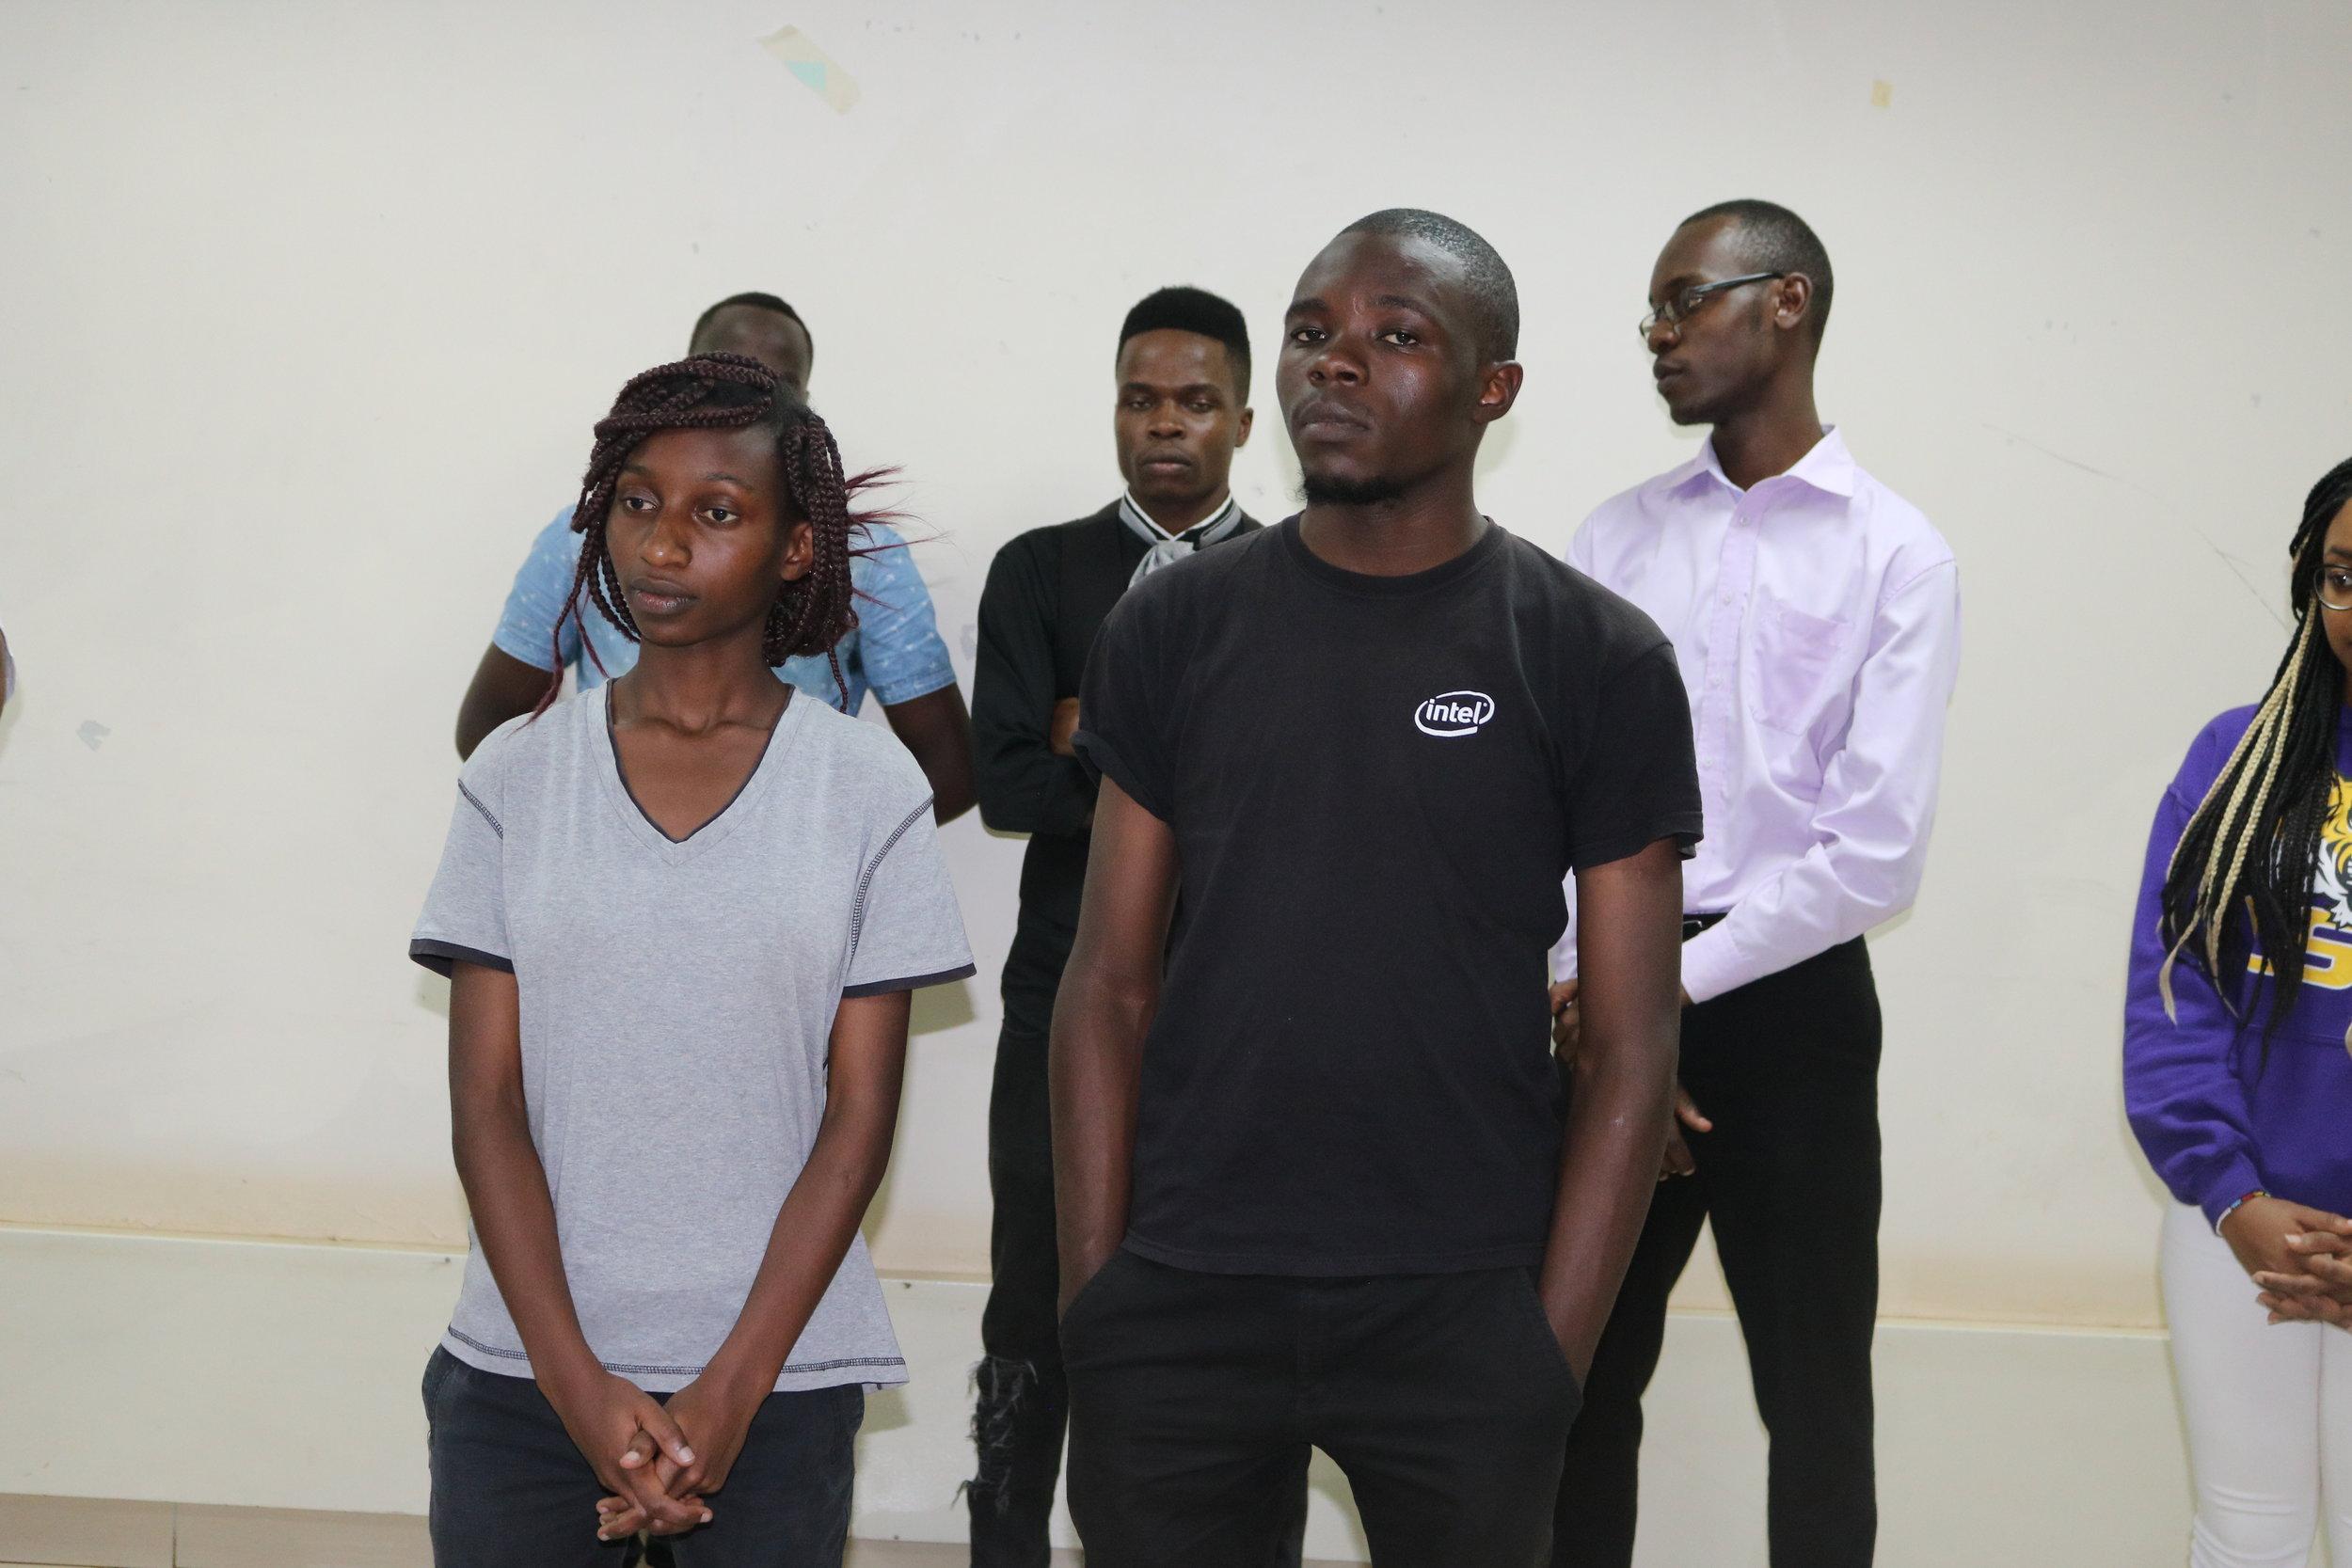 Full scholarship winners Sylvia Ngari and Fidel Makatia